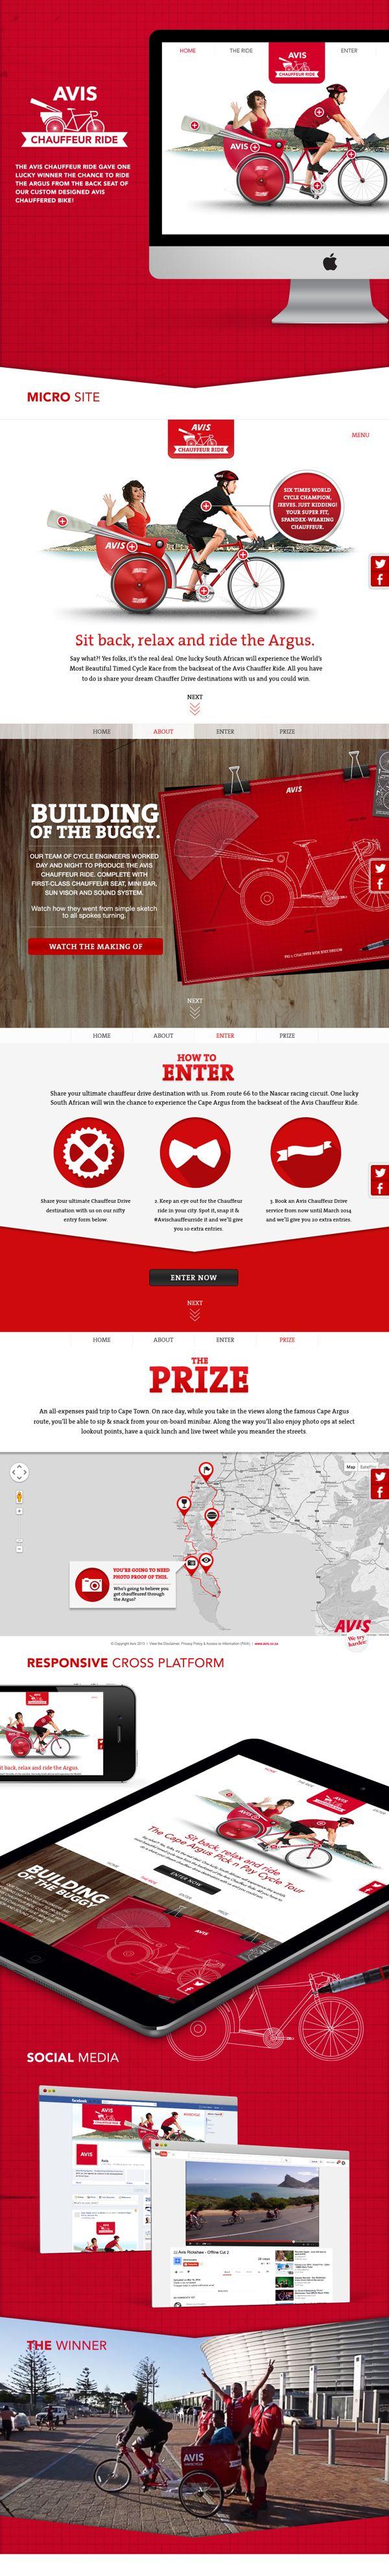 Avis, Micro Site, Comp,  Campaign